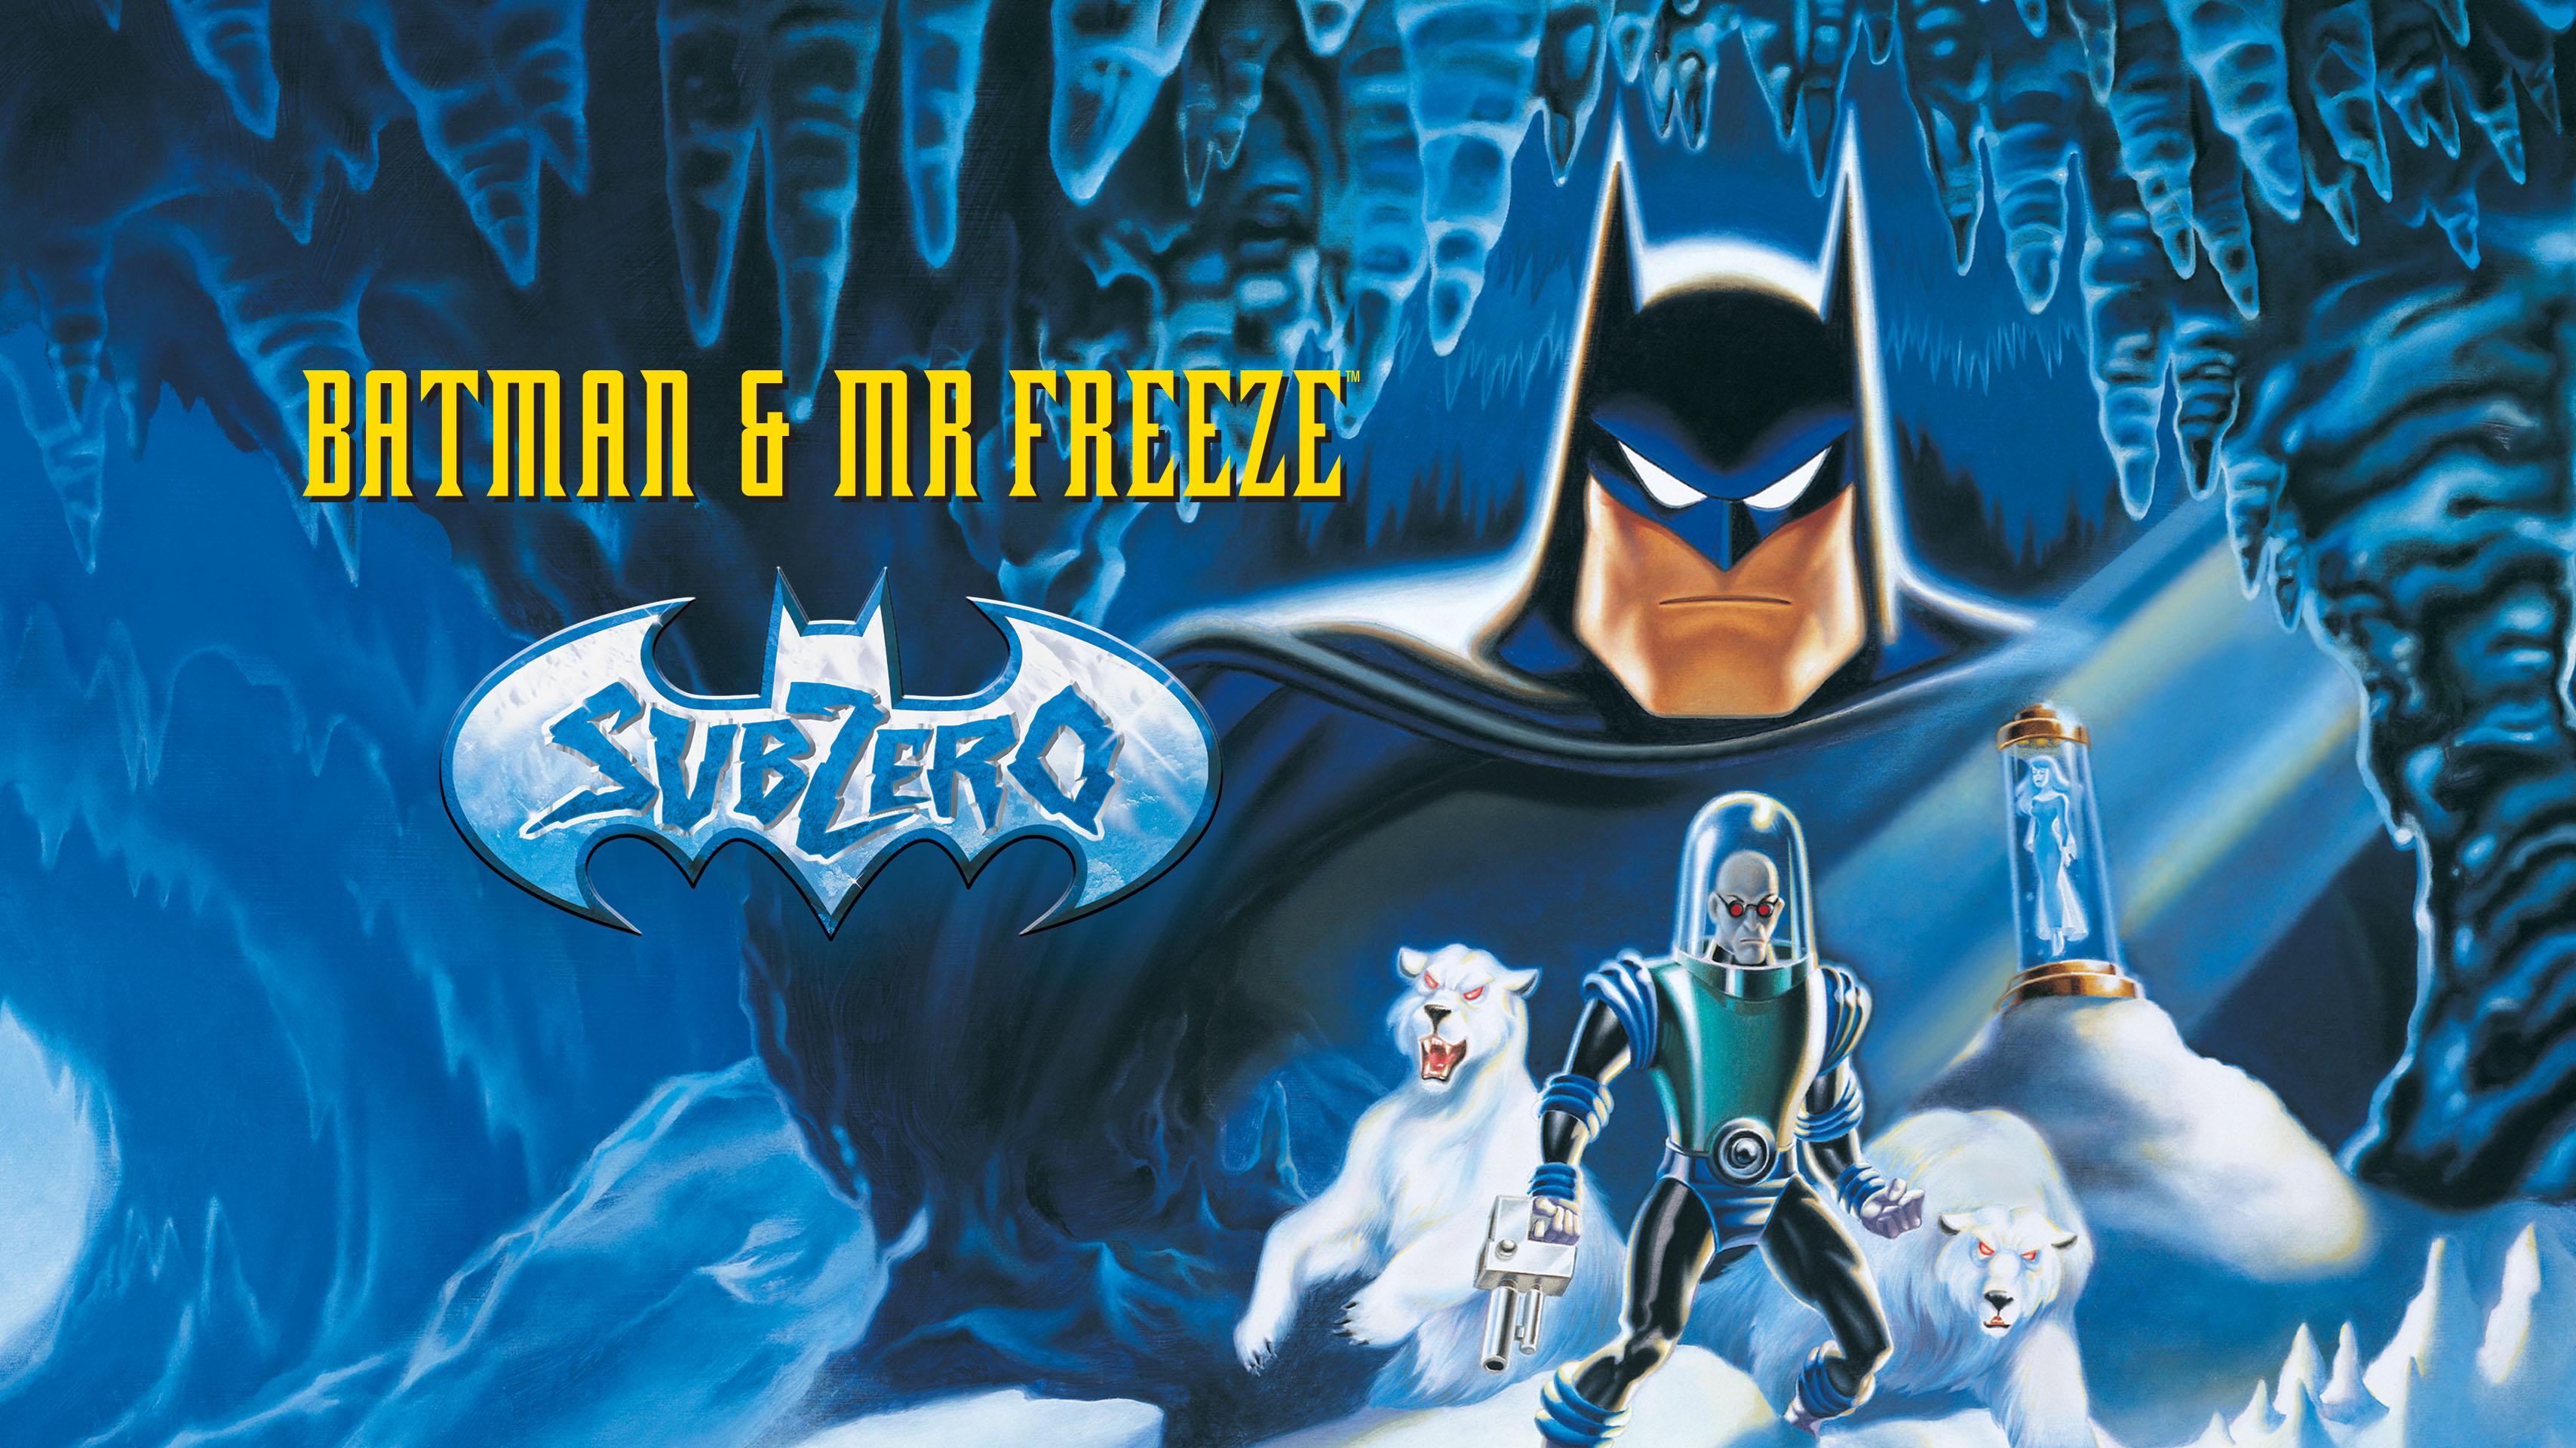 BatmanMrFreeze_H_DD_KA_TT_3415X1920_300dpi_EN.jpg